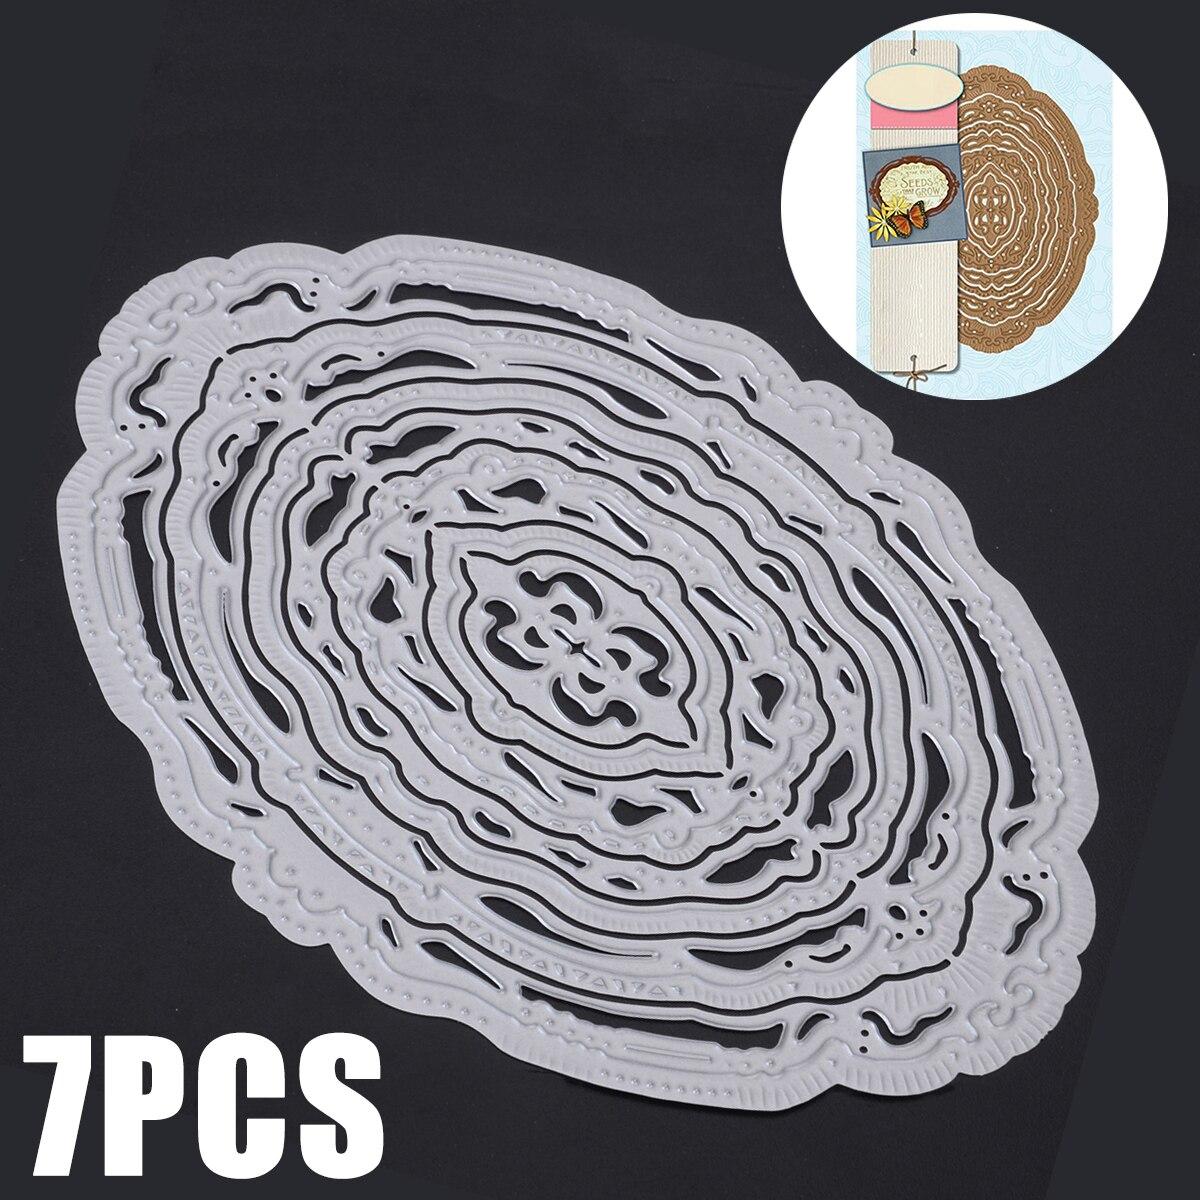 7pcs Oval Metal Cutting Dies for DIY Scrapbook Embossing Paper Card Making Embossing Stencil Making Embossing Stencil